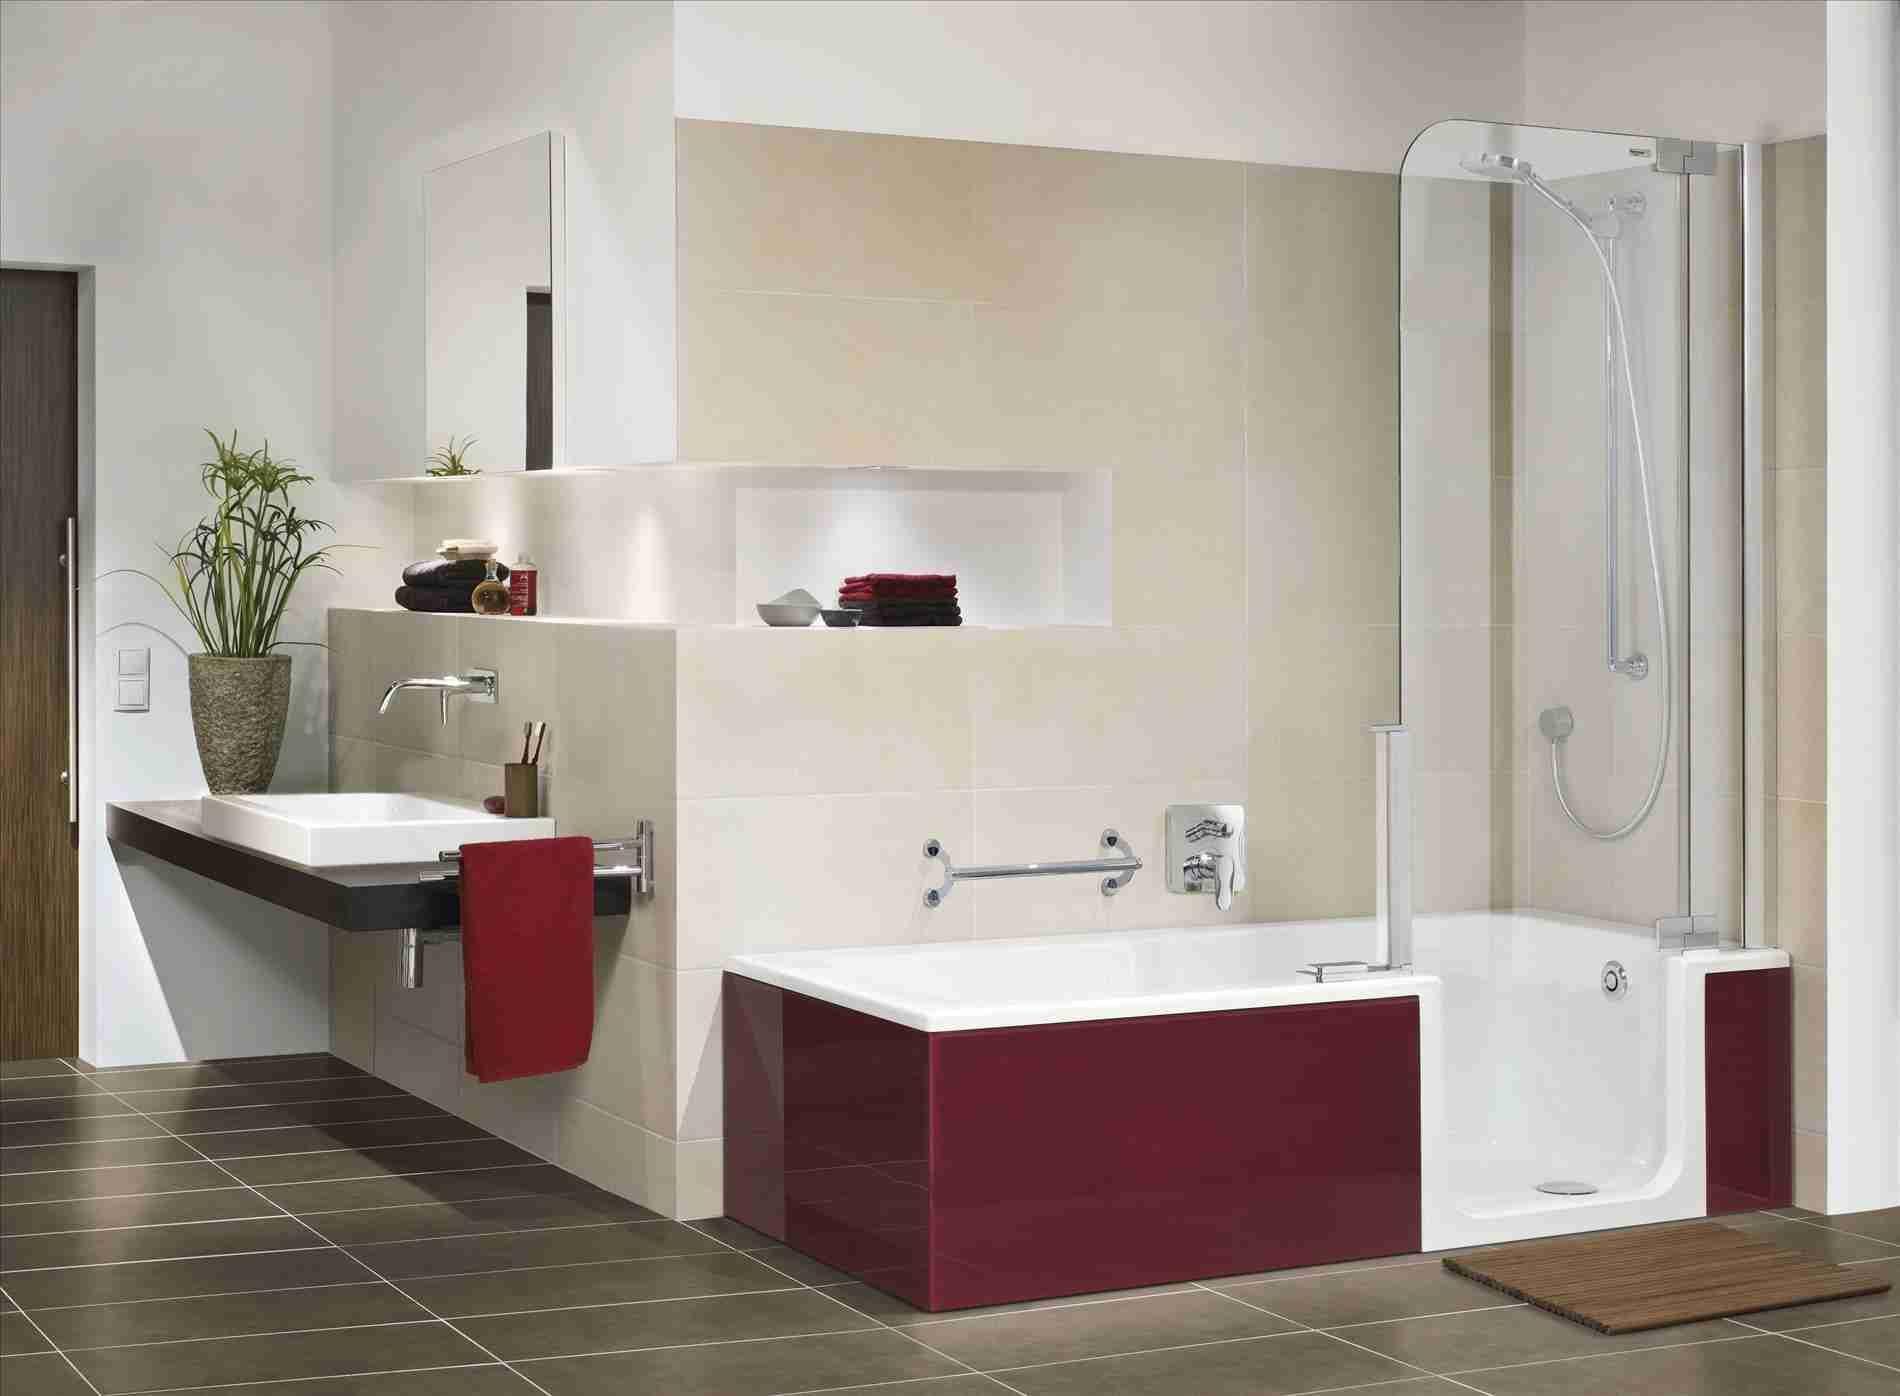 New post Trending-bathtub shower combo home depot-Visit-entermp3 ...